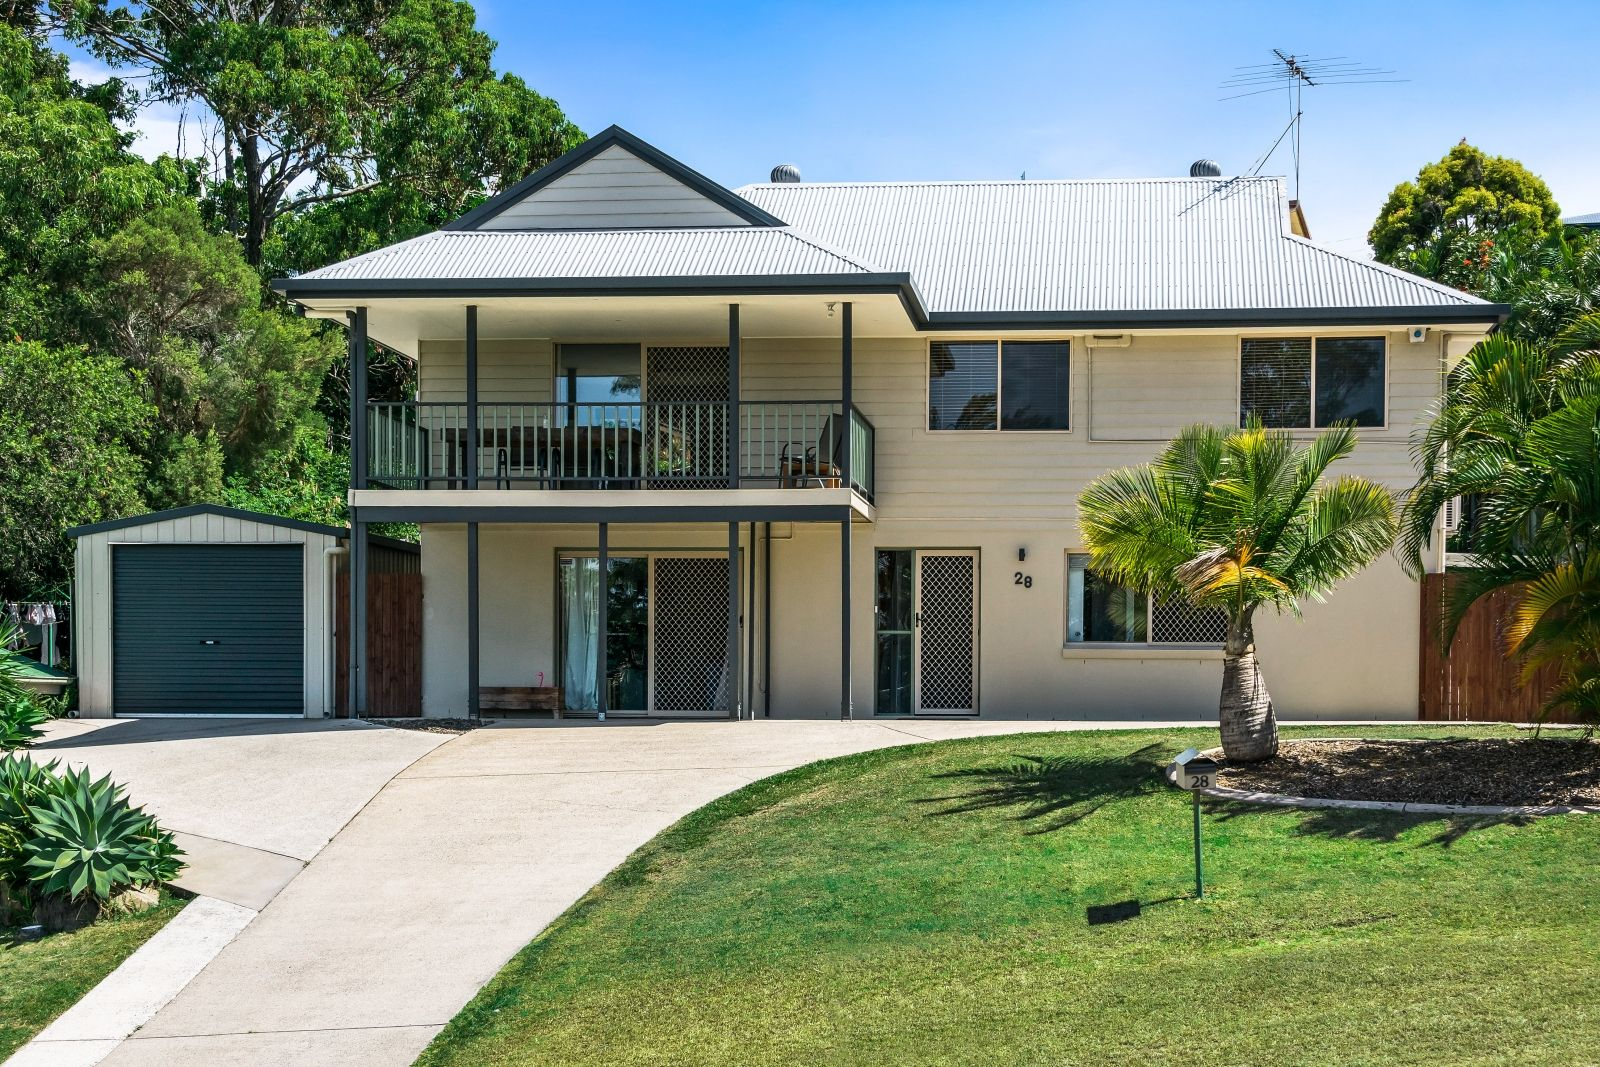 28 Kingfisher Street, Aroona QLD 4551, Image 0